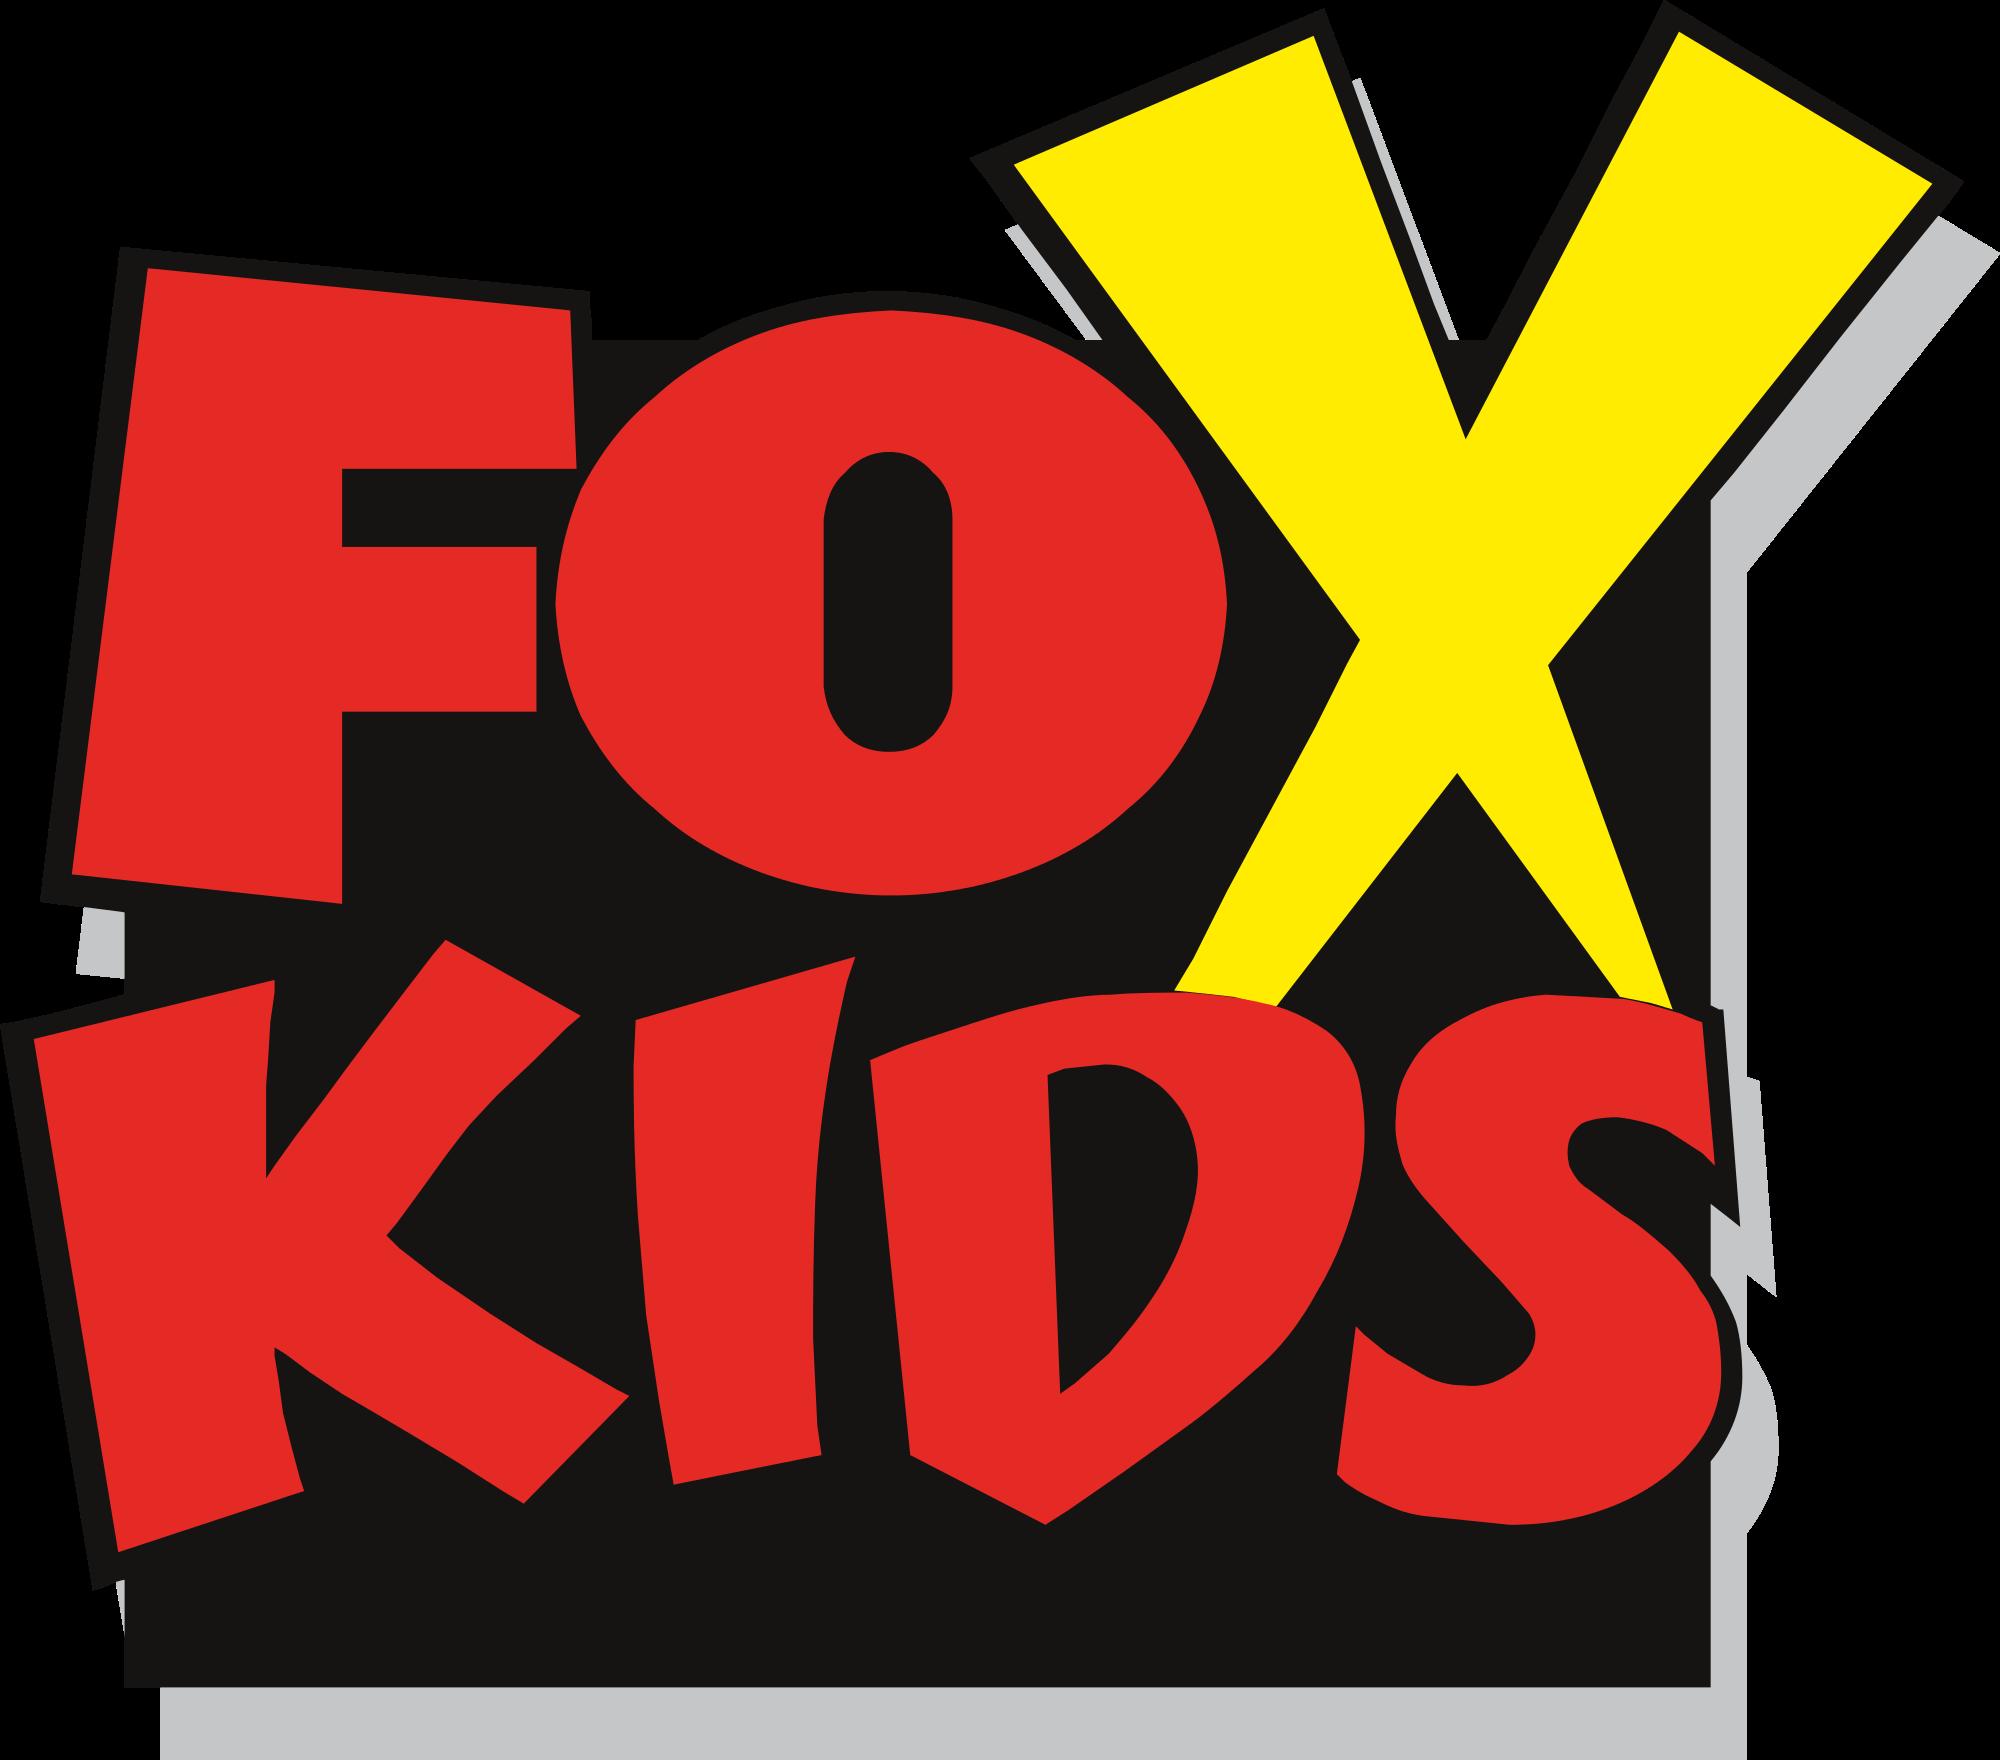 Fox kids wikipedia the. Information clipart encyclopedia